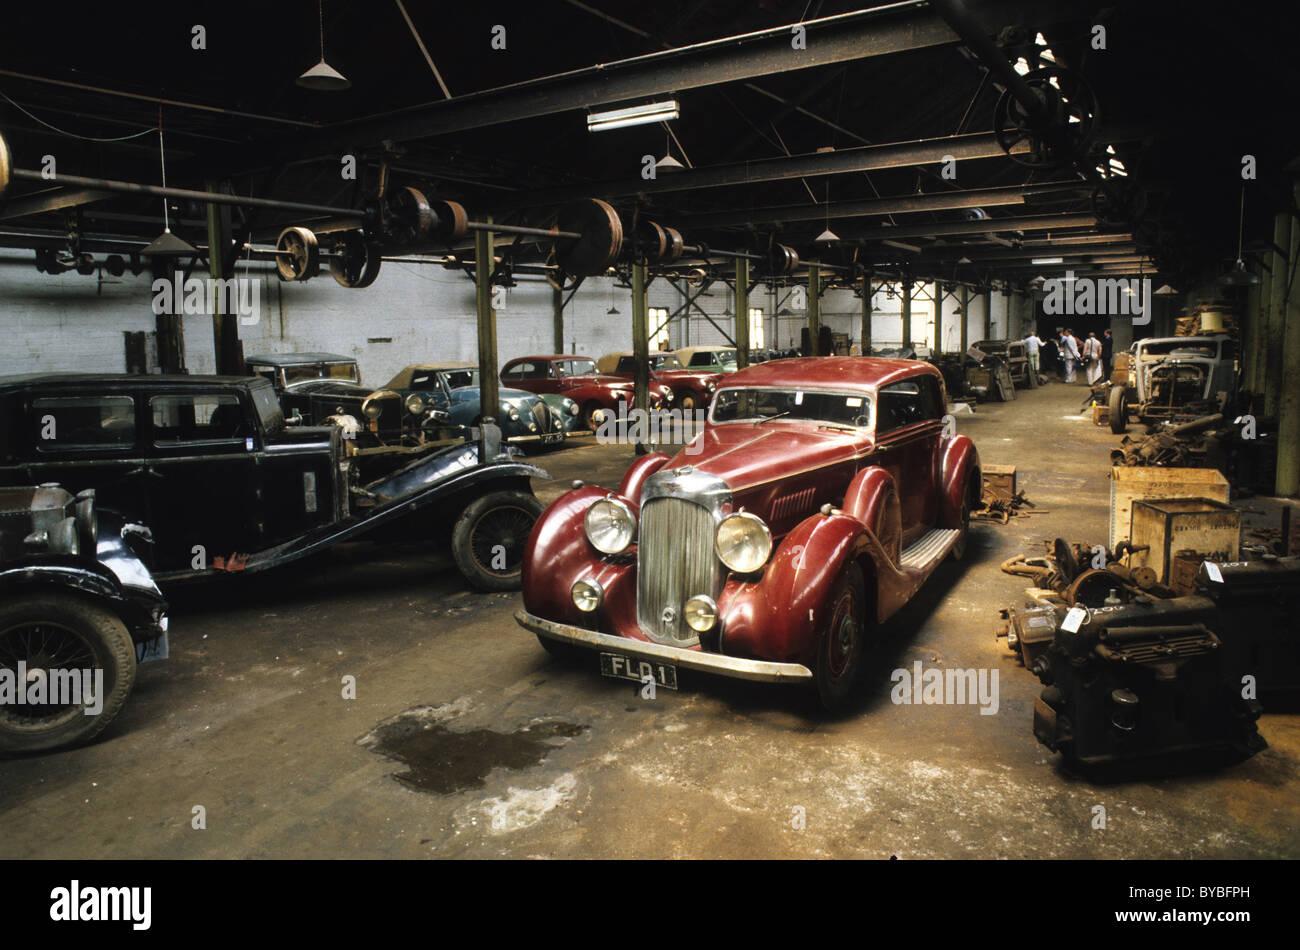 British Car Auction Stock Photos & British Car Auction Stock Images ...